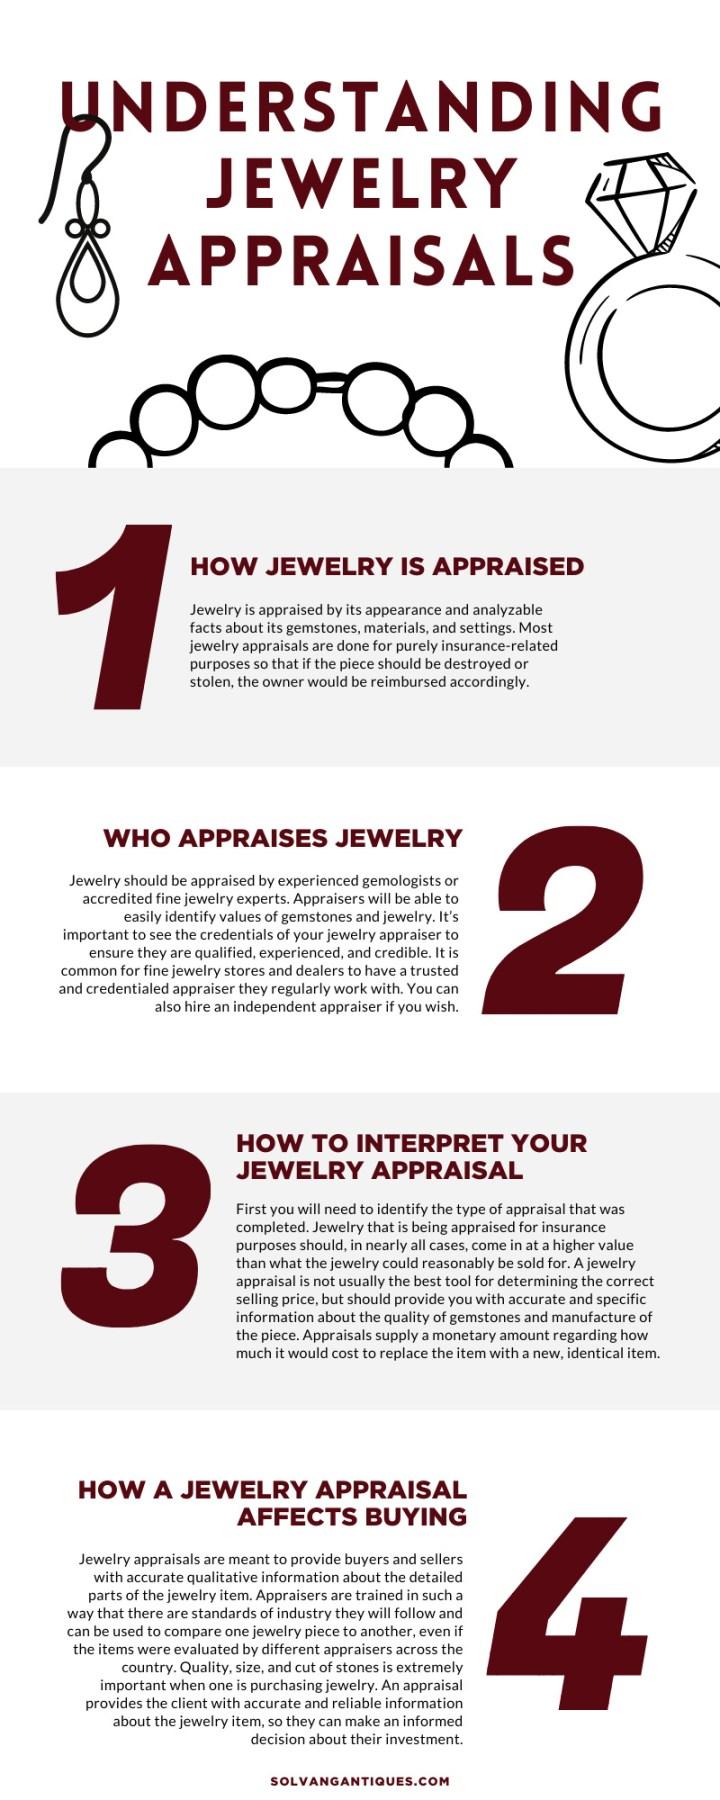 Understanding Jewelry Appraisals